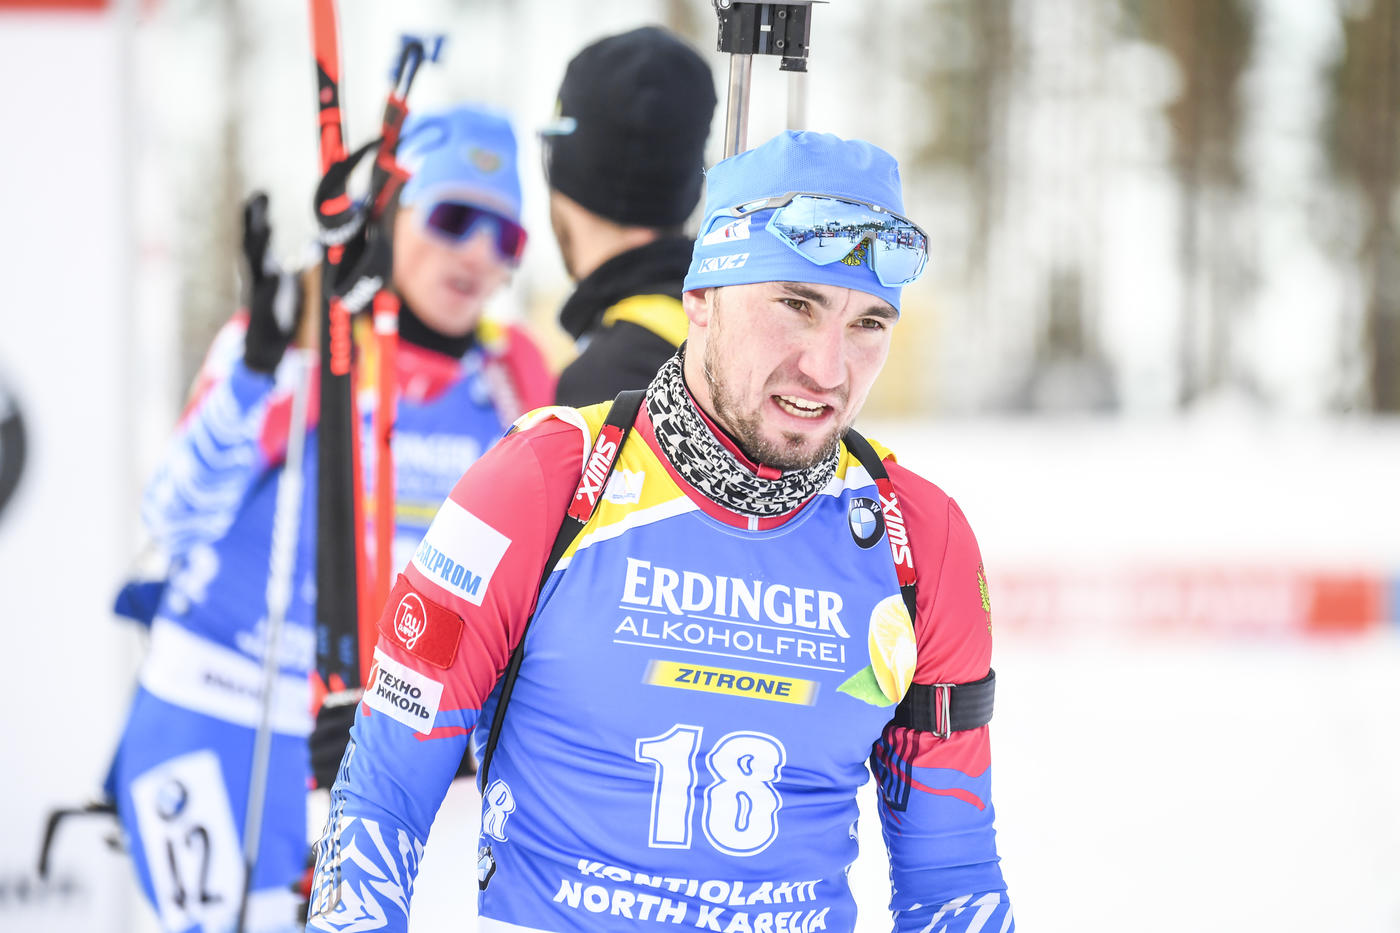 Назван новый тренер чемпиона мира Александра Логинова - фото